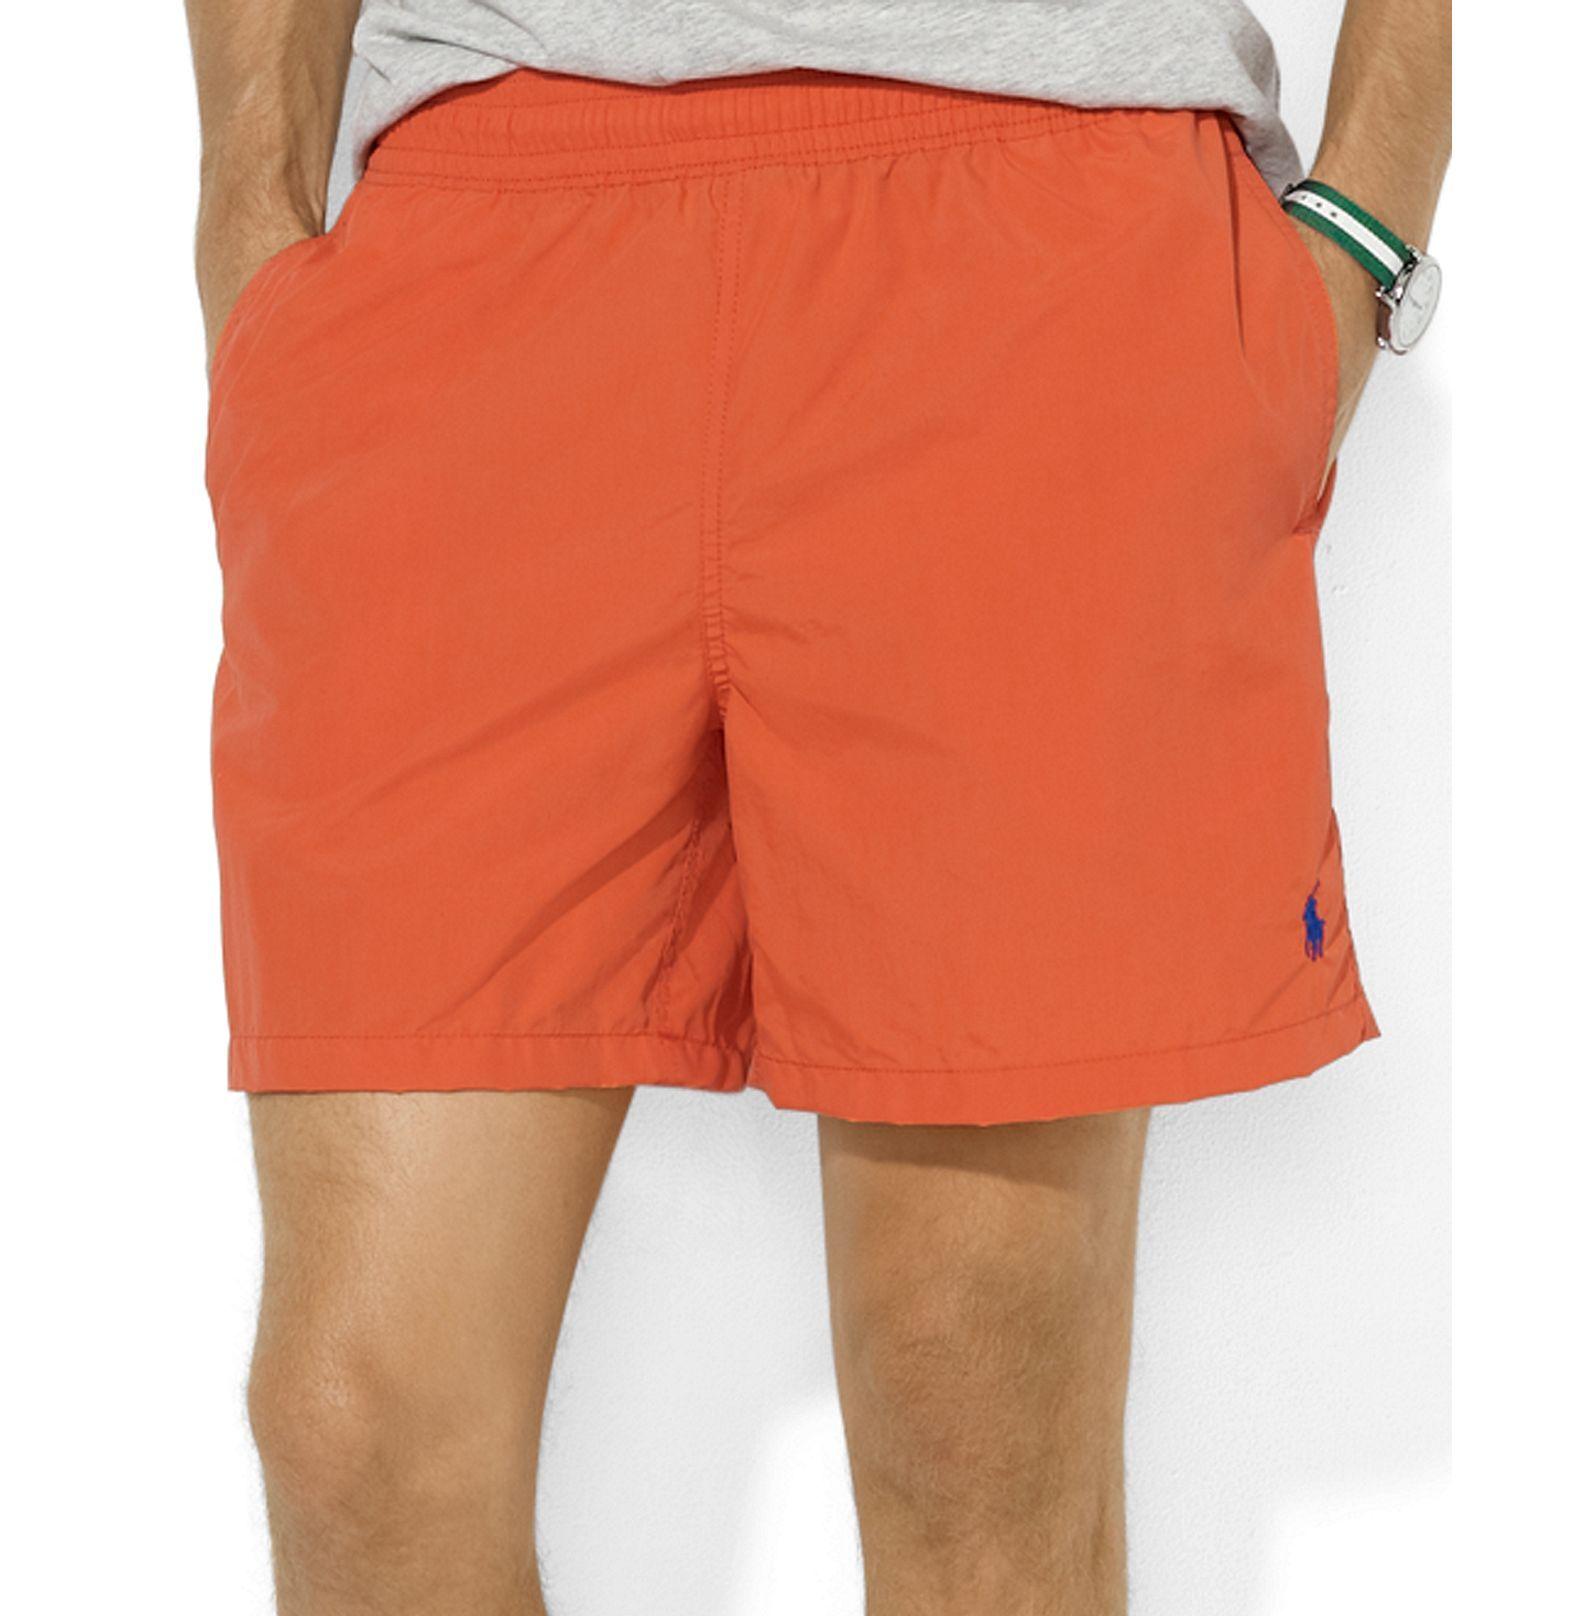 921fc468 Polo Ralph Lauren Swimwear, Hawaiian Swim Boxers - Mens Swim ...